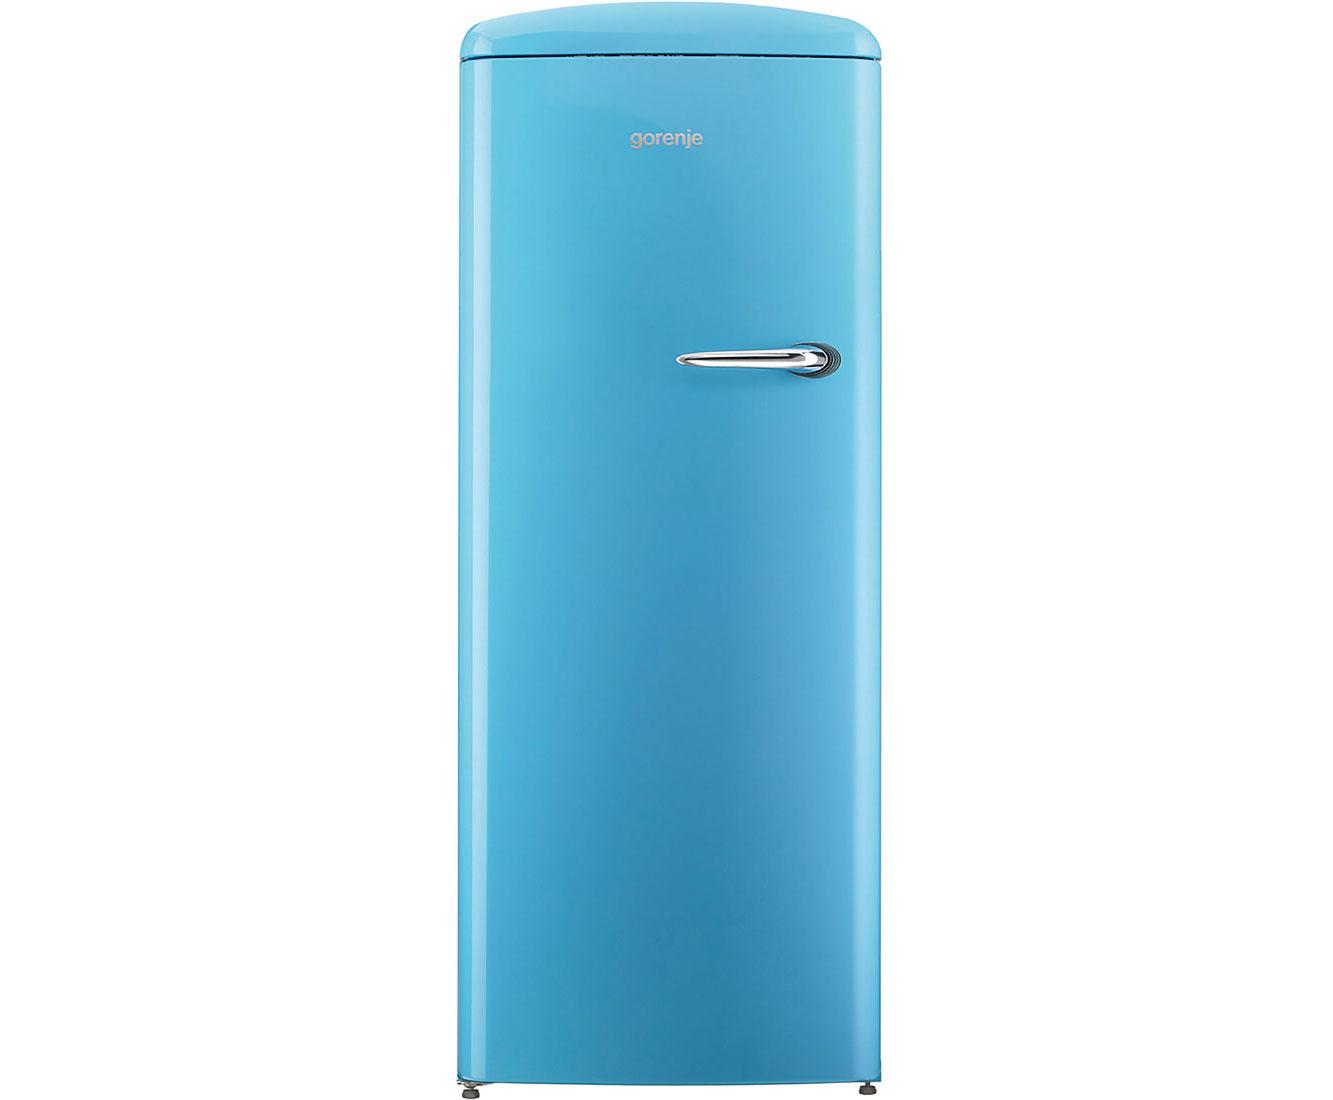 Kühlschrank Bekleben Retro : Kühlschrank farbig liebherr kbies 4350 20 a stand kühlschrank 60cm